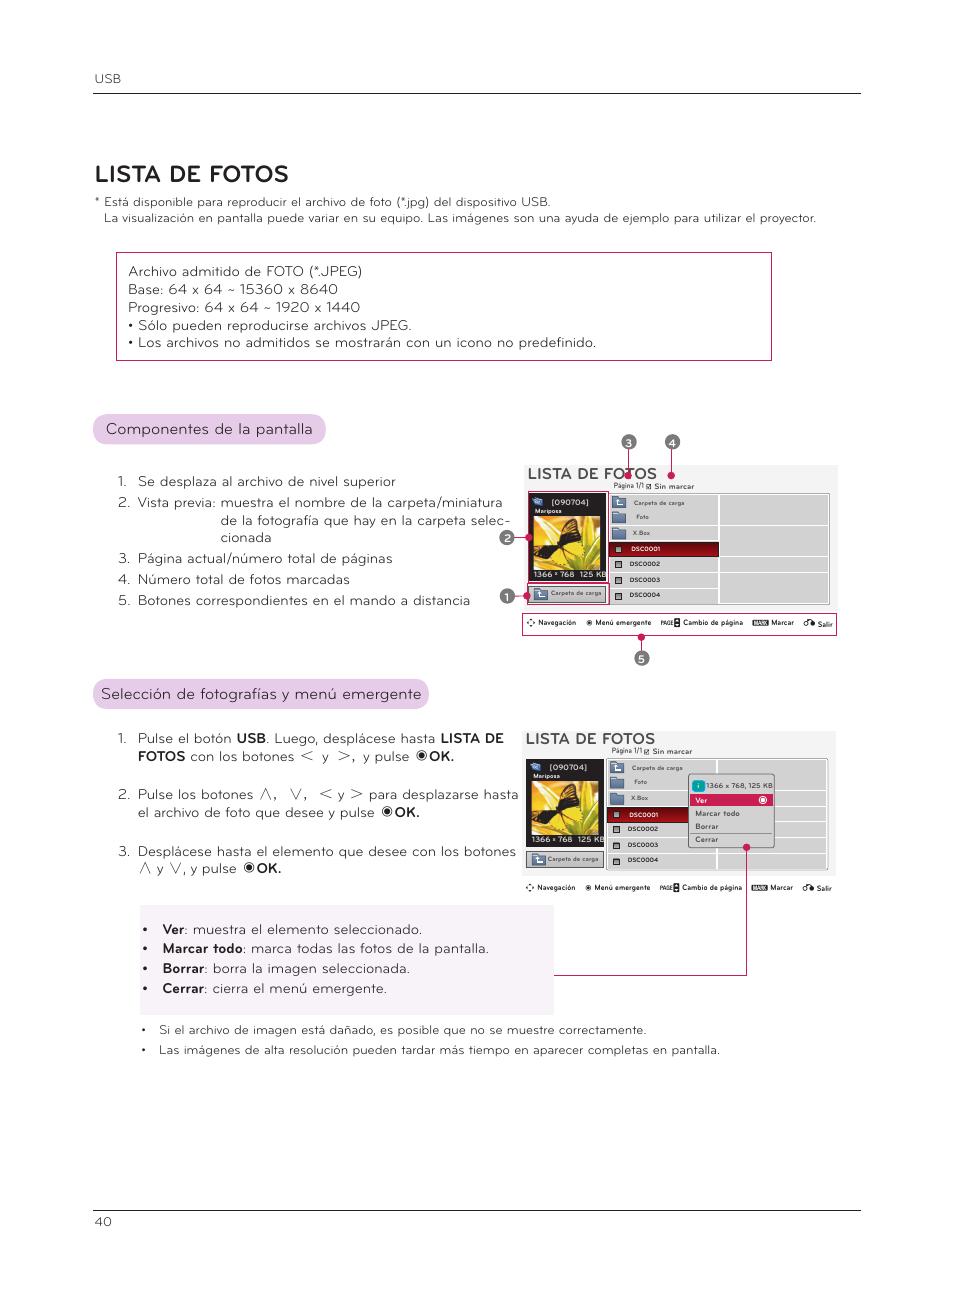 Articulaci/ón de direcci/ón delantera izquierda inferior derecha para CLS280 CLS350 E240 E350 C219 W211 S211 1998-2012 2203330327